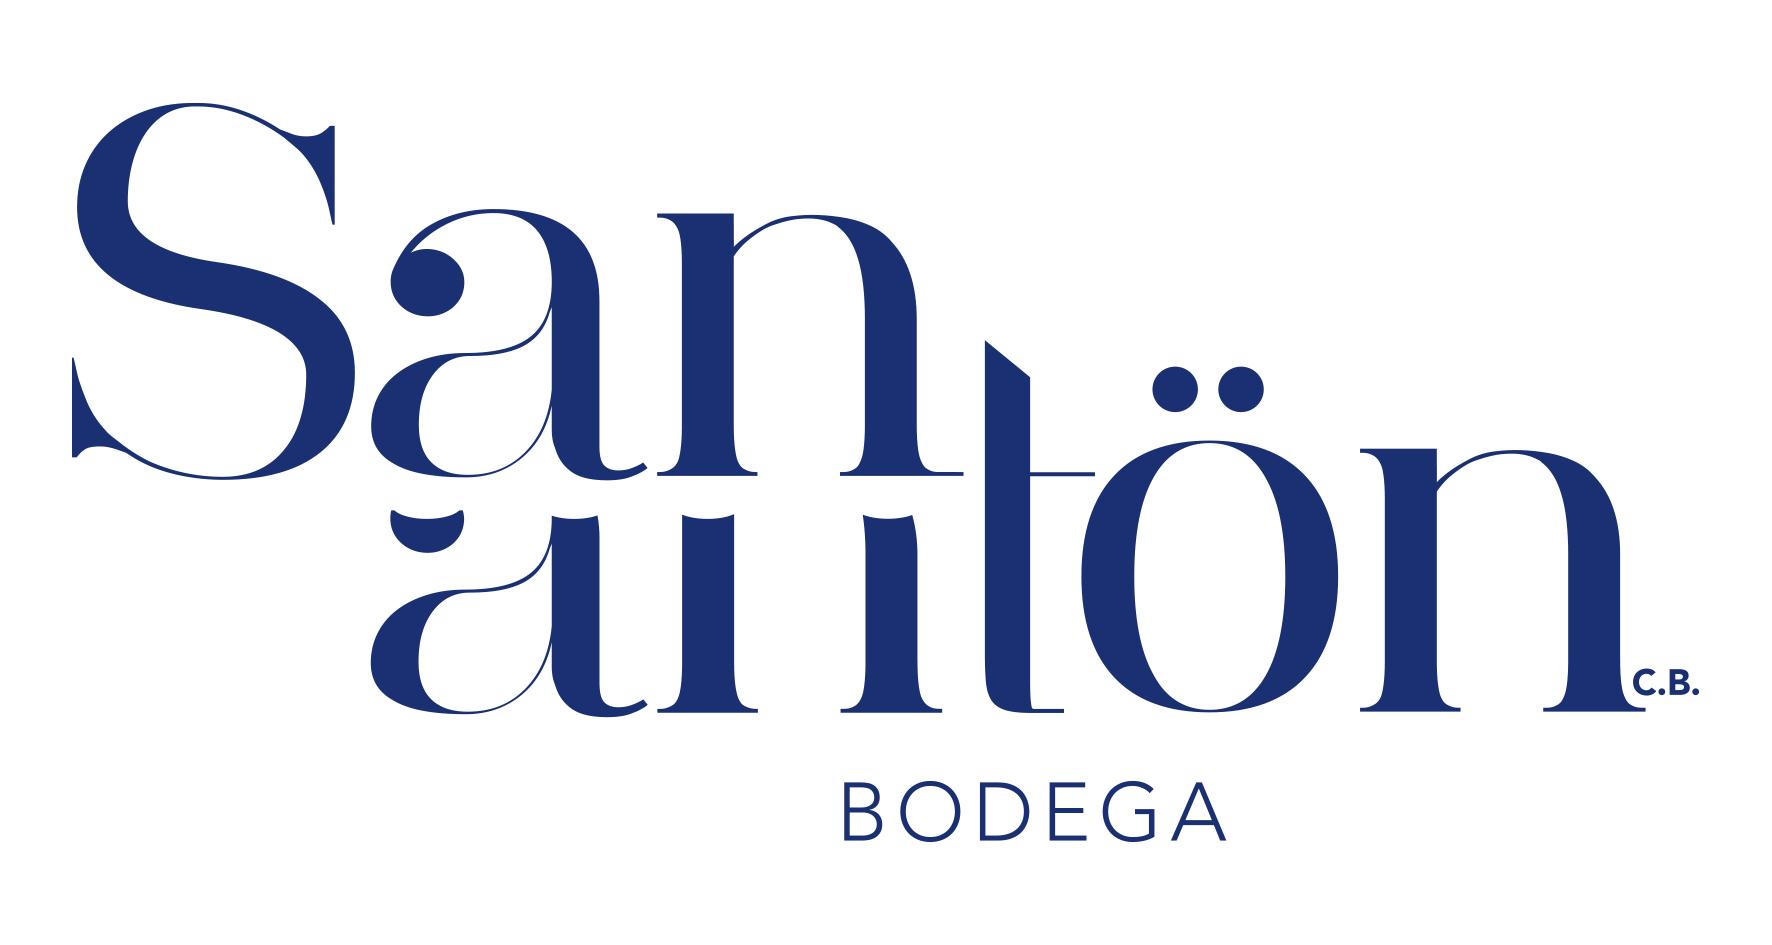 LogoColorBSanAnton.jpg